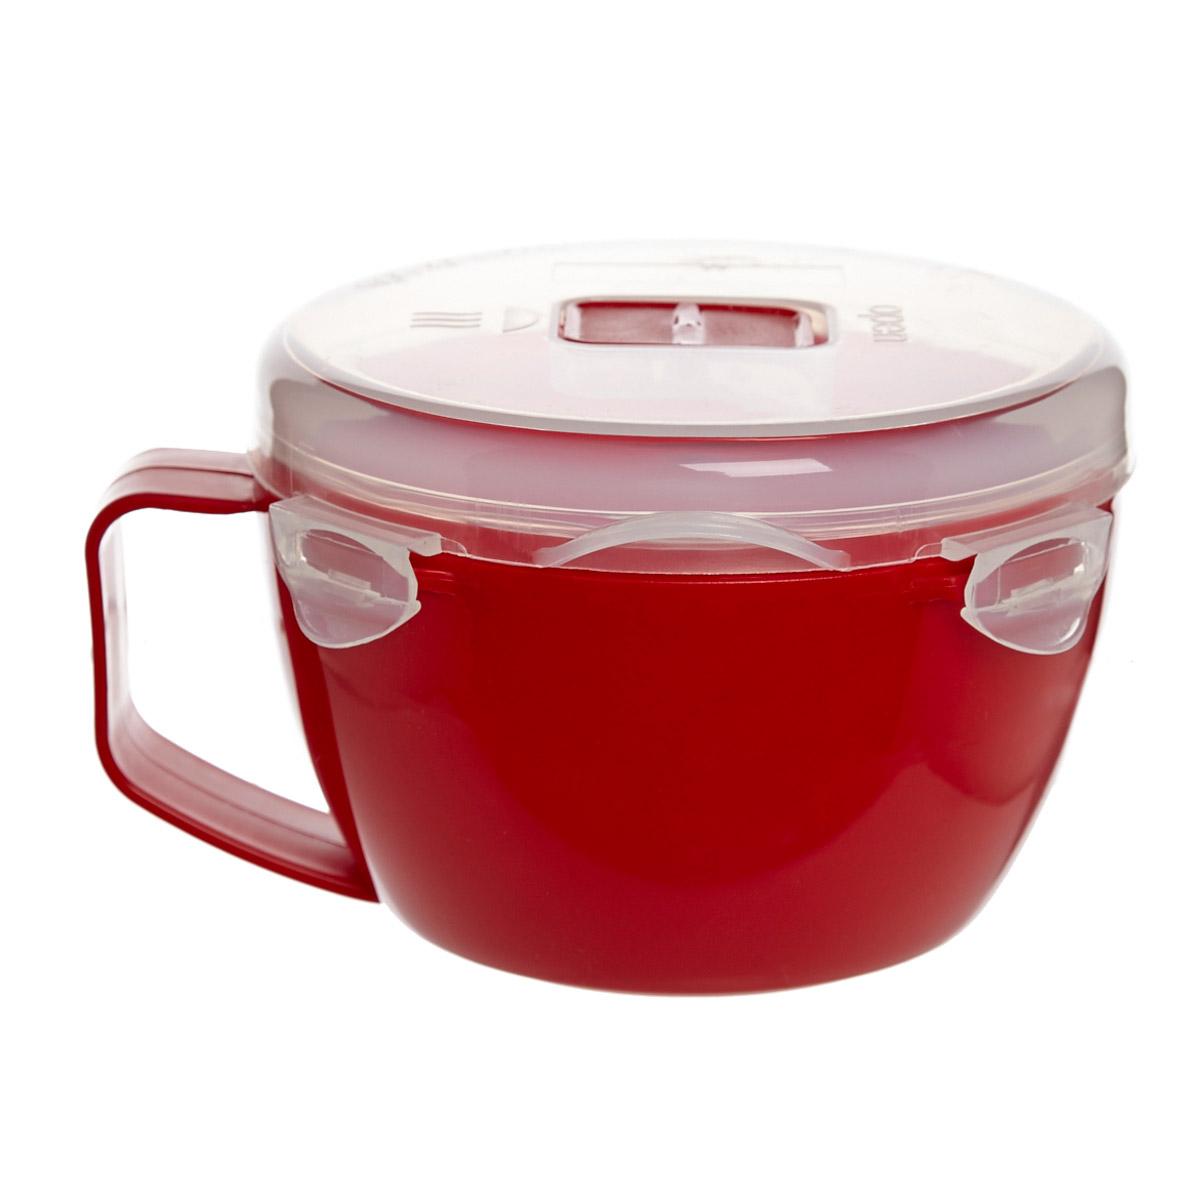 microwave steamer bowl